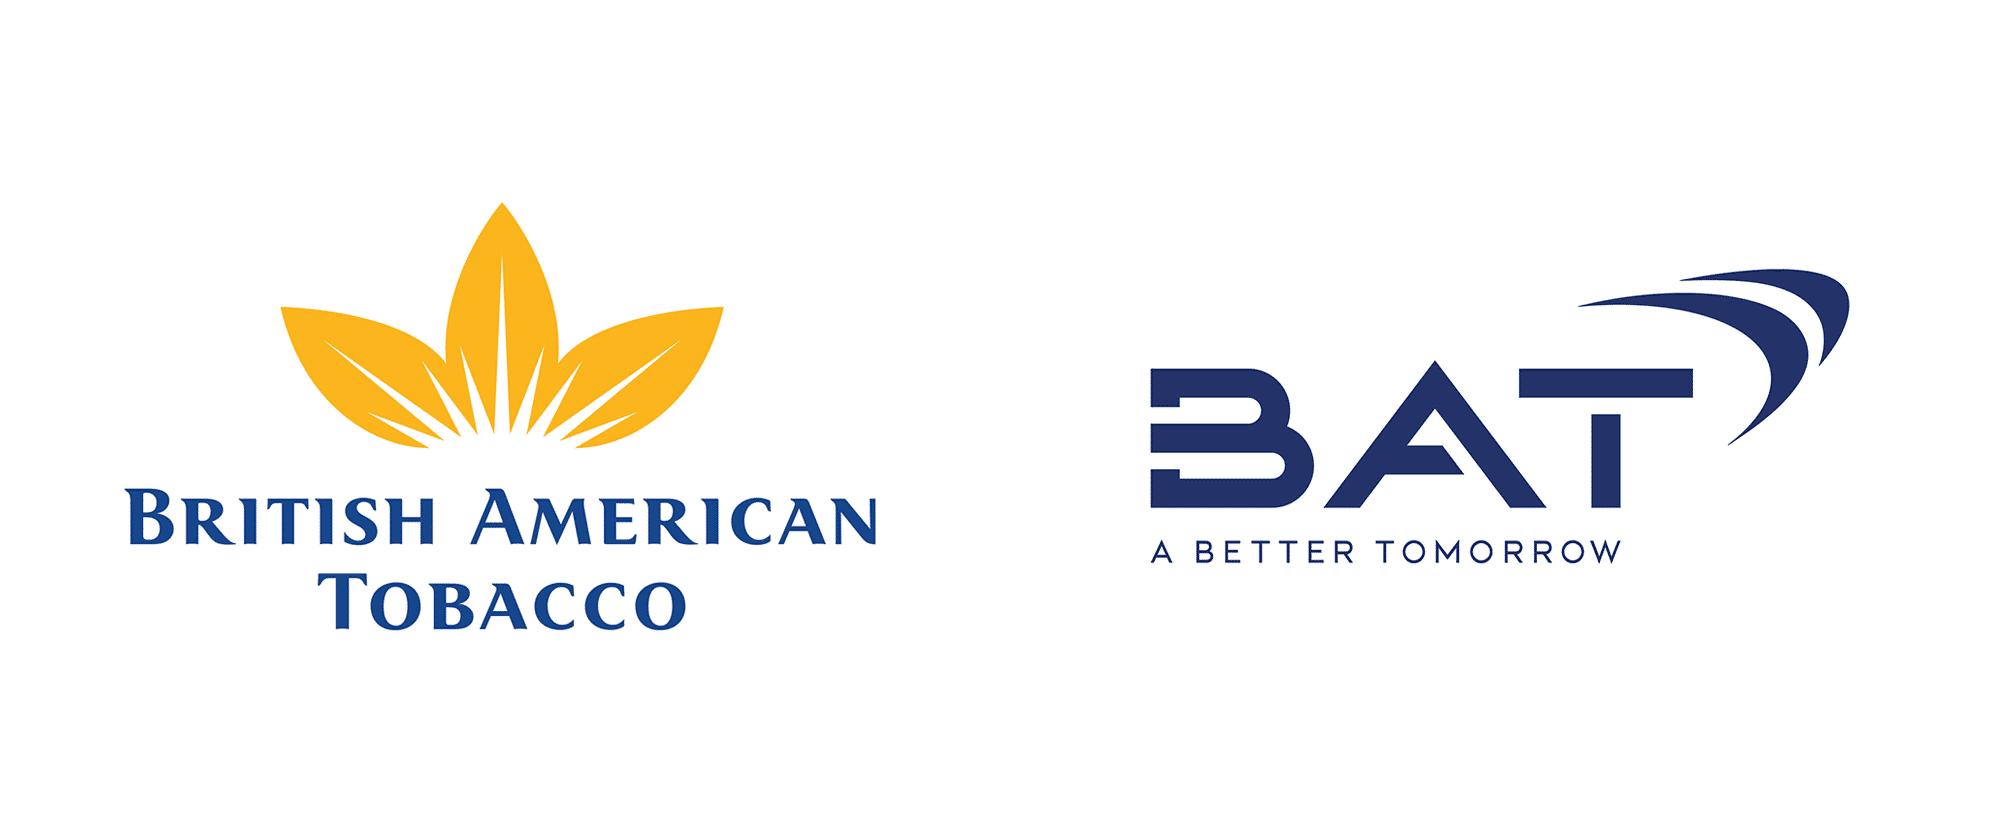 British American Tobacco Nigeria Recruitment for Graduate Fleet Managers